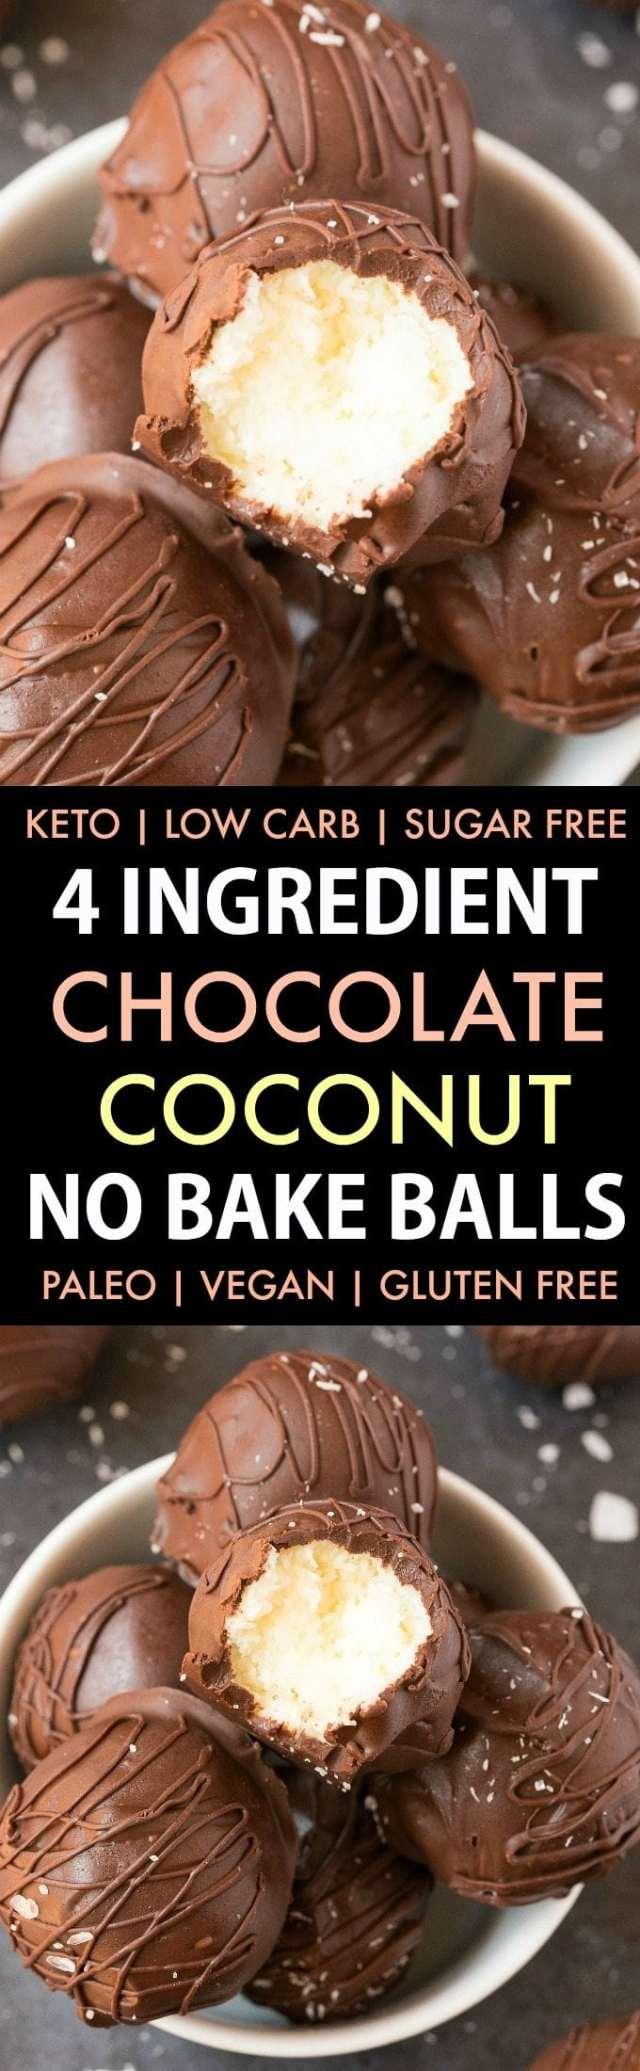 4-Ingredient Paleo Vegan Chocolate Coconut No Bake Balls in a collage